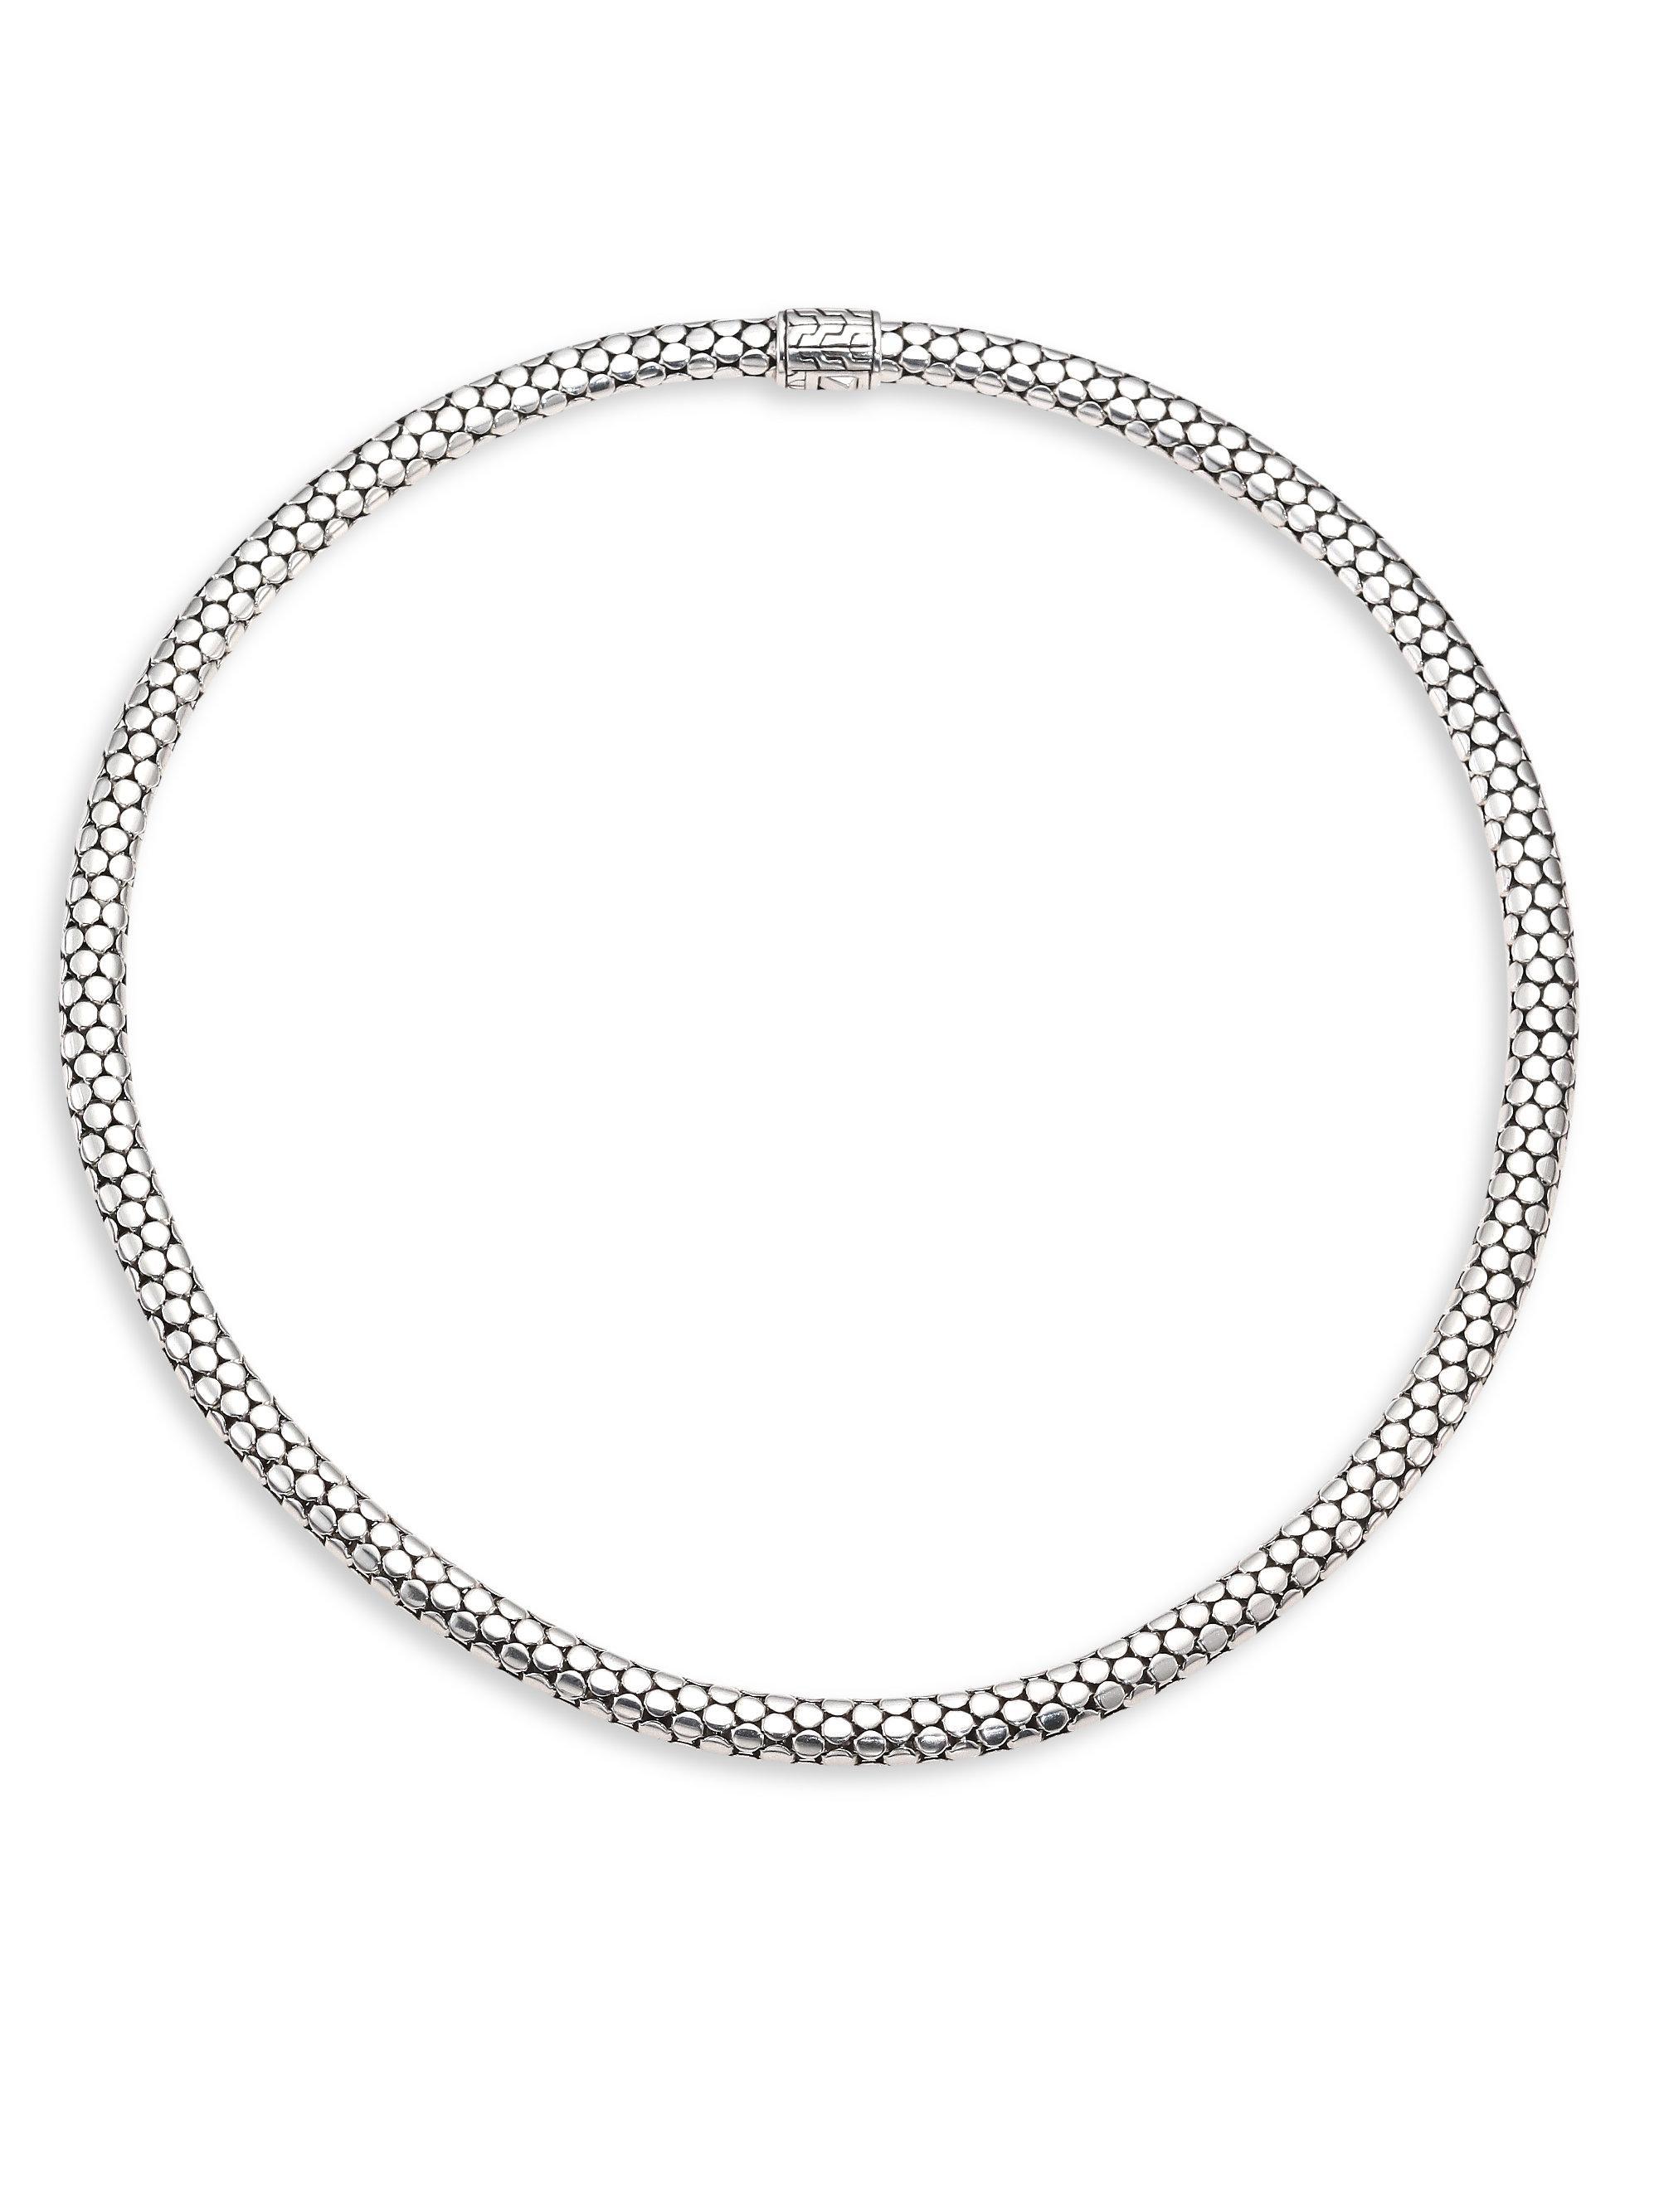 John Hardy Dot Tube Enhancer Chain Necklace ISjn2jl5Z